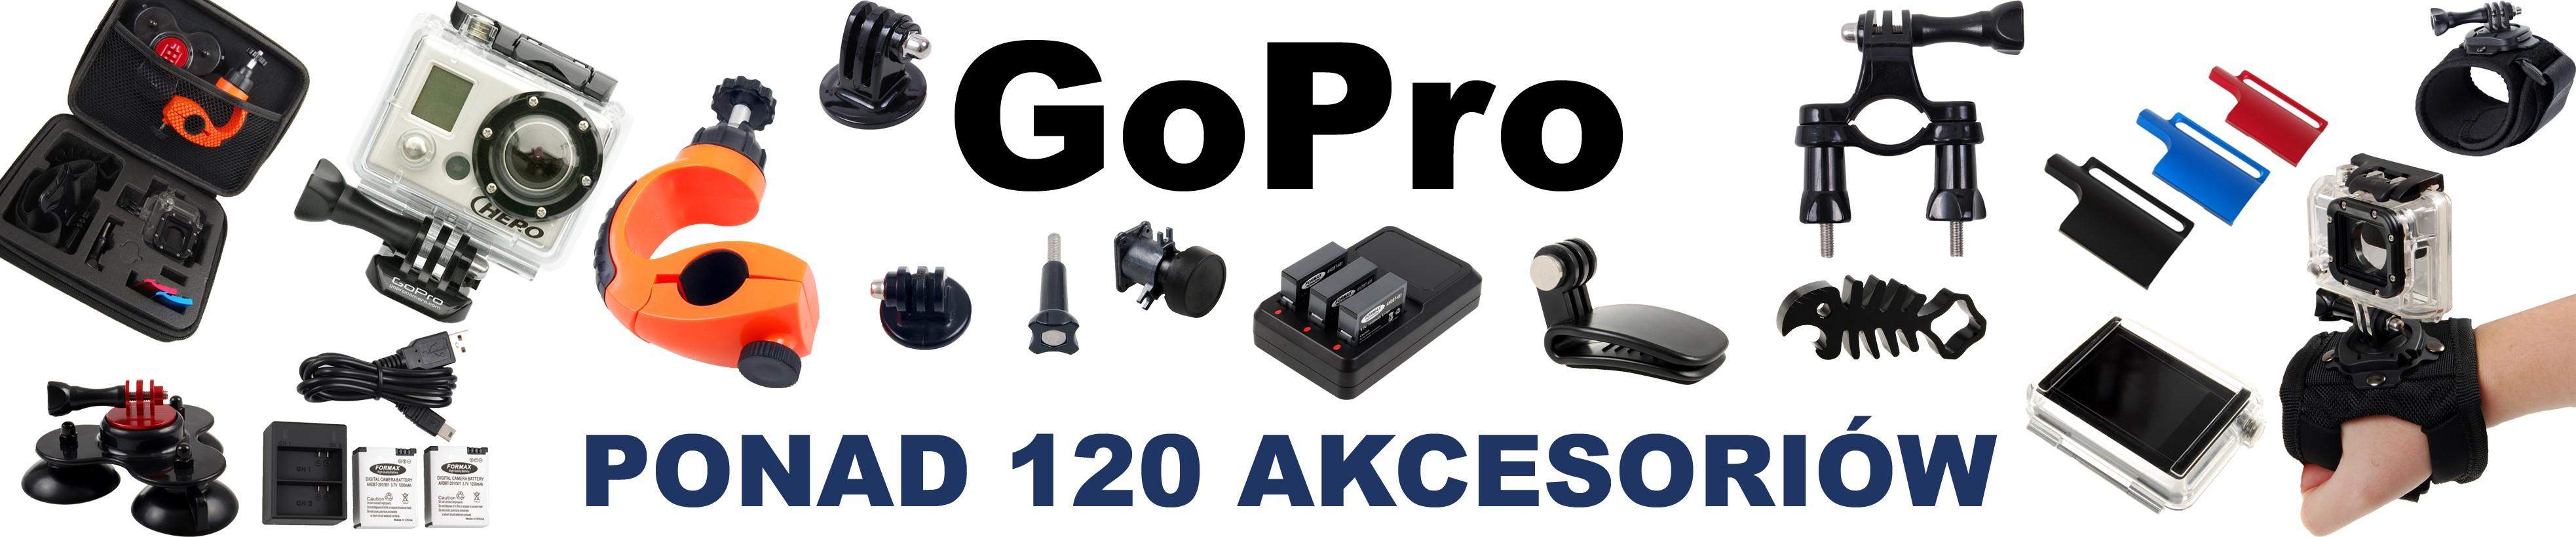 Akcesoria GoPro